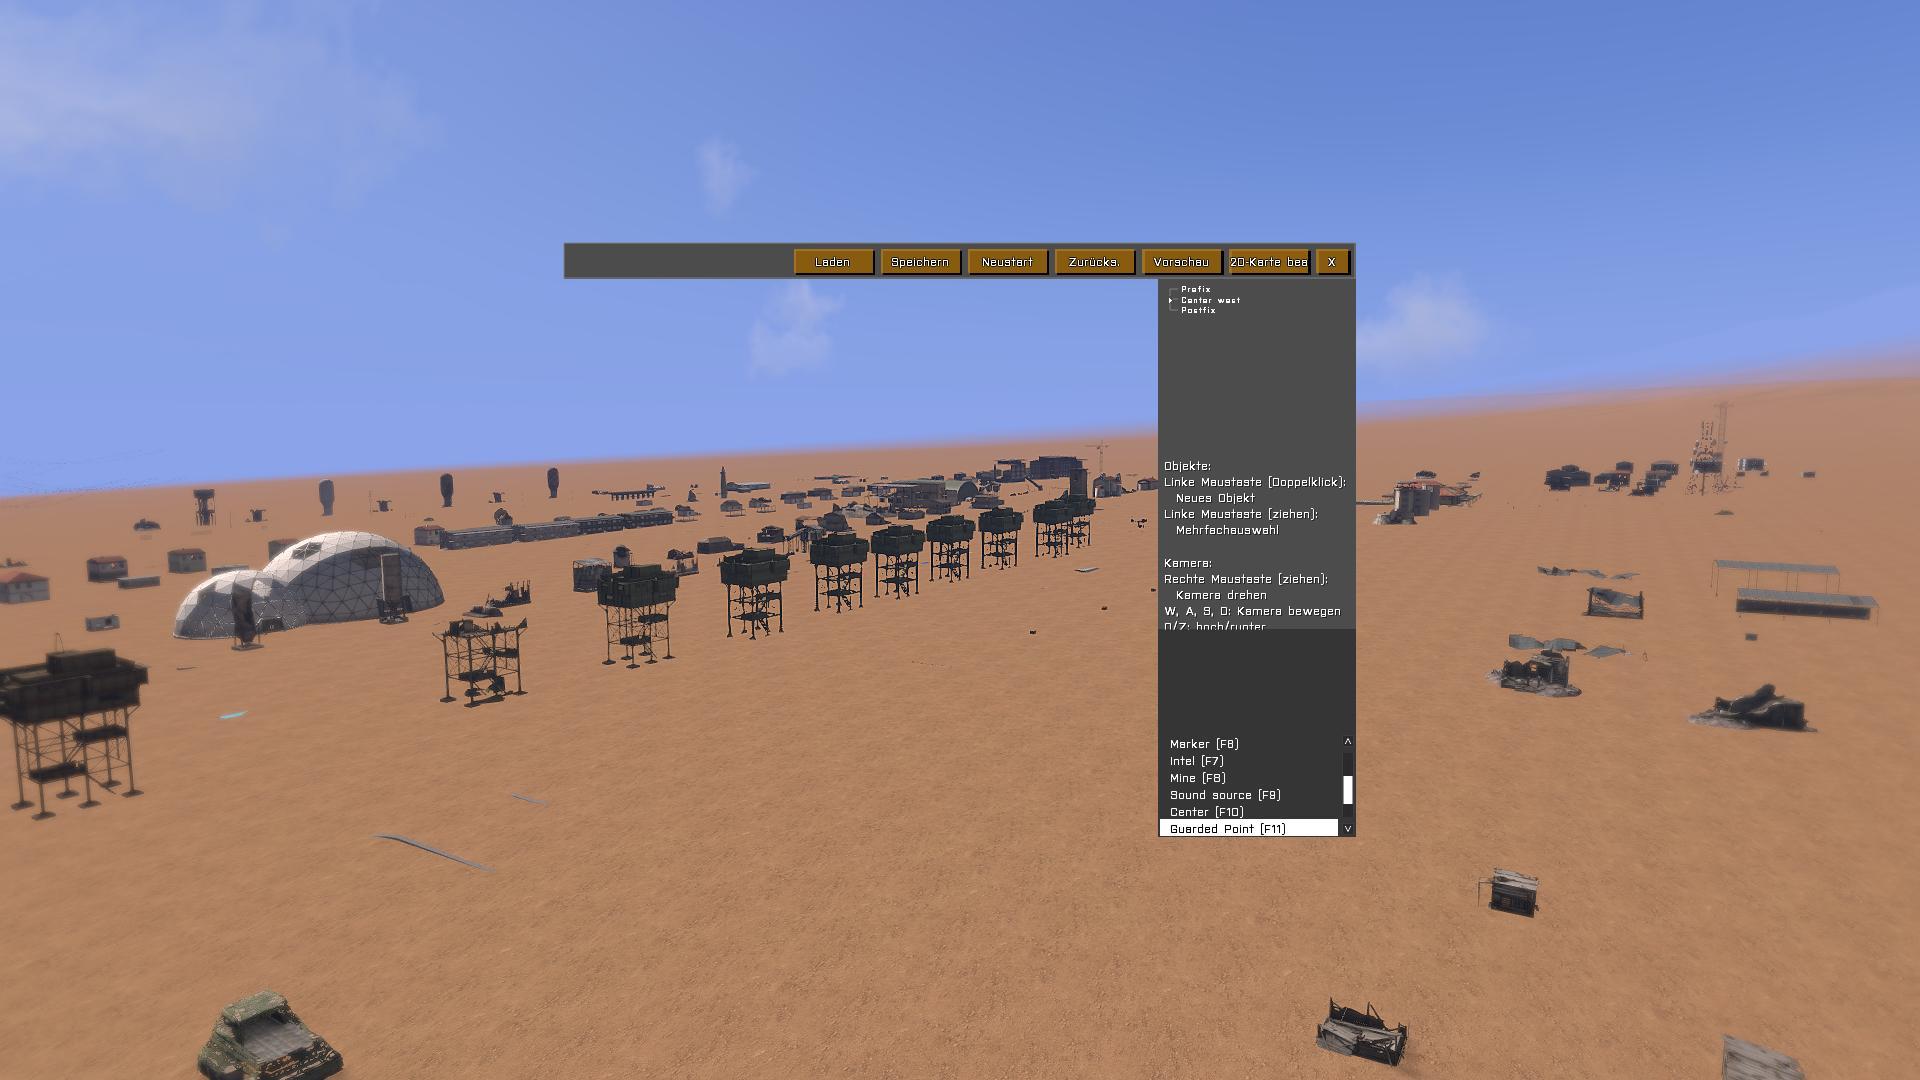 Arma 2 Warfare Maps Related Keywords & Suggestions - Arma 2